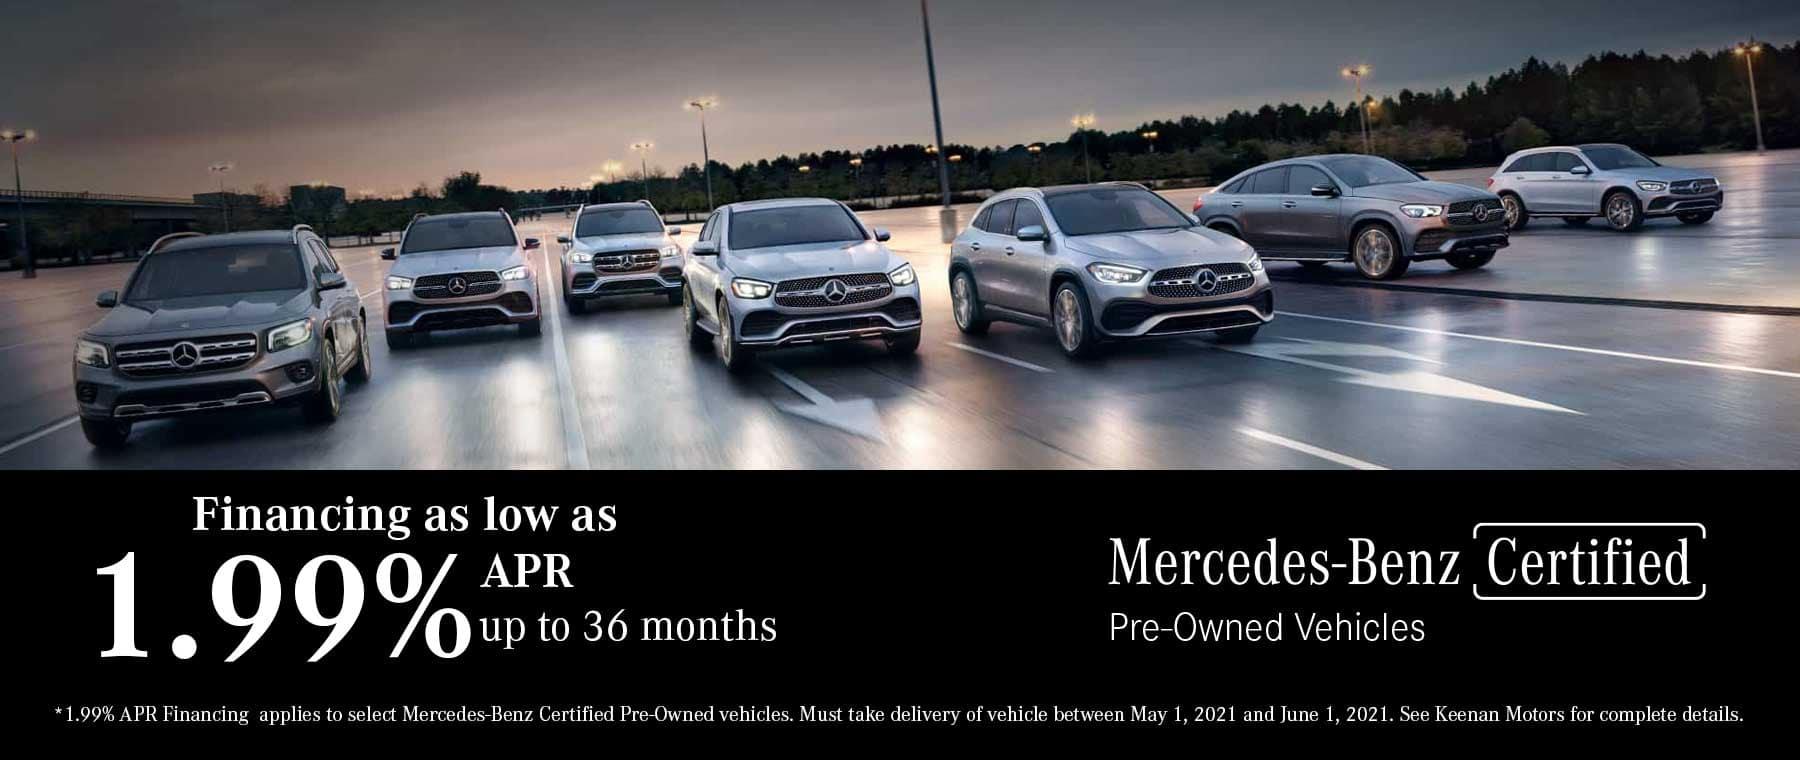 Mercedes-Benz Certified Pre-Owned Special Financing at Keenan Motors